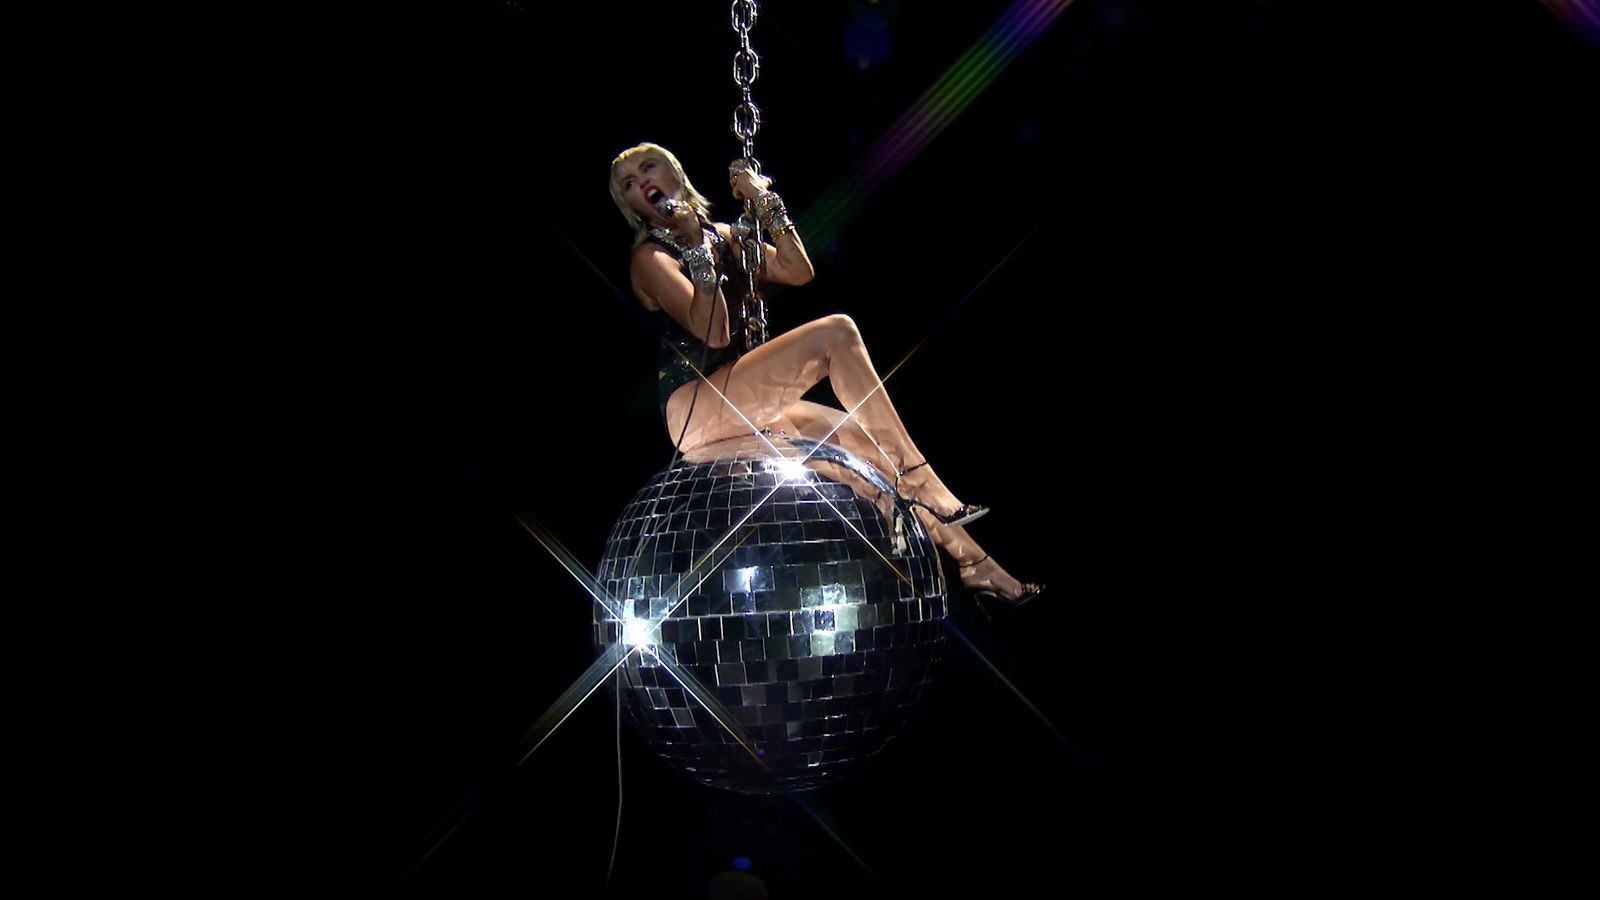 Miley Cyrus performs during the 2020 MTV VMAs